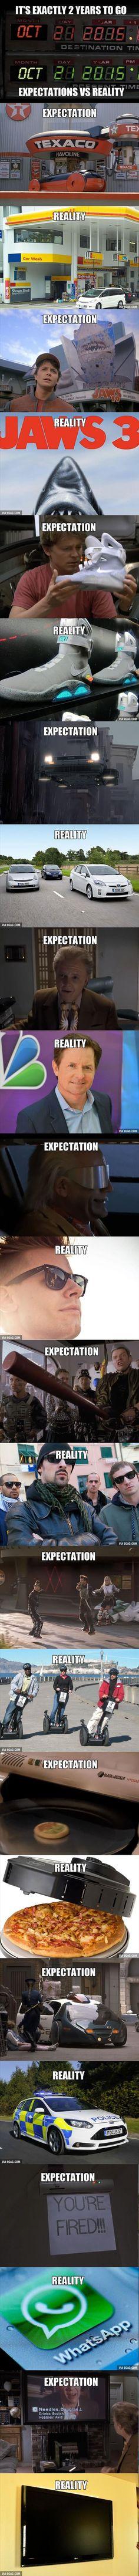 Back To The Future Expectations vs Reality – 25 Pics